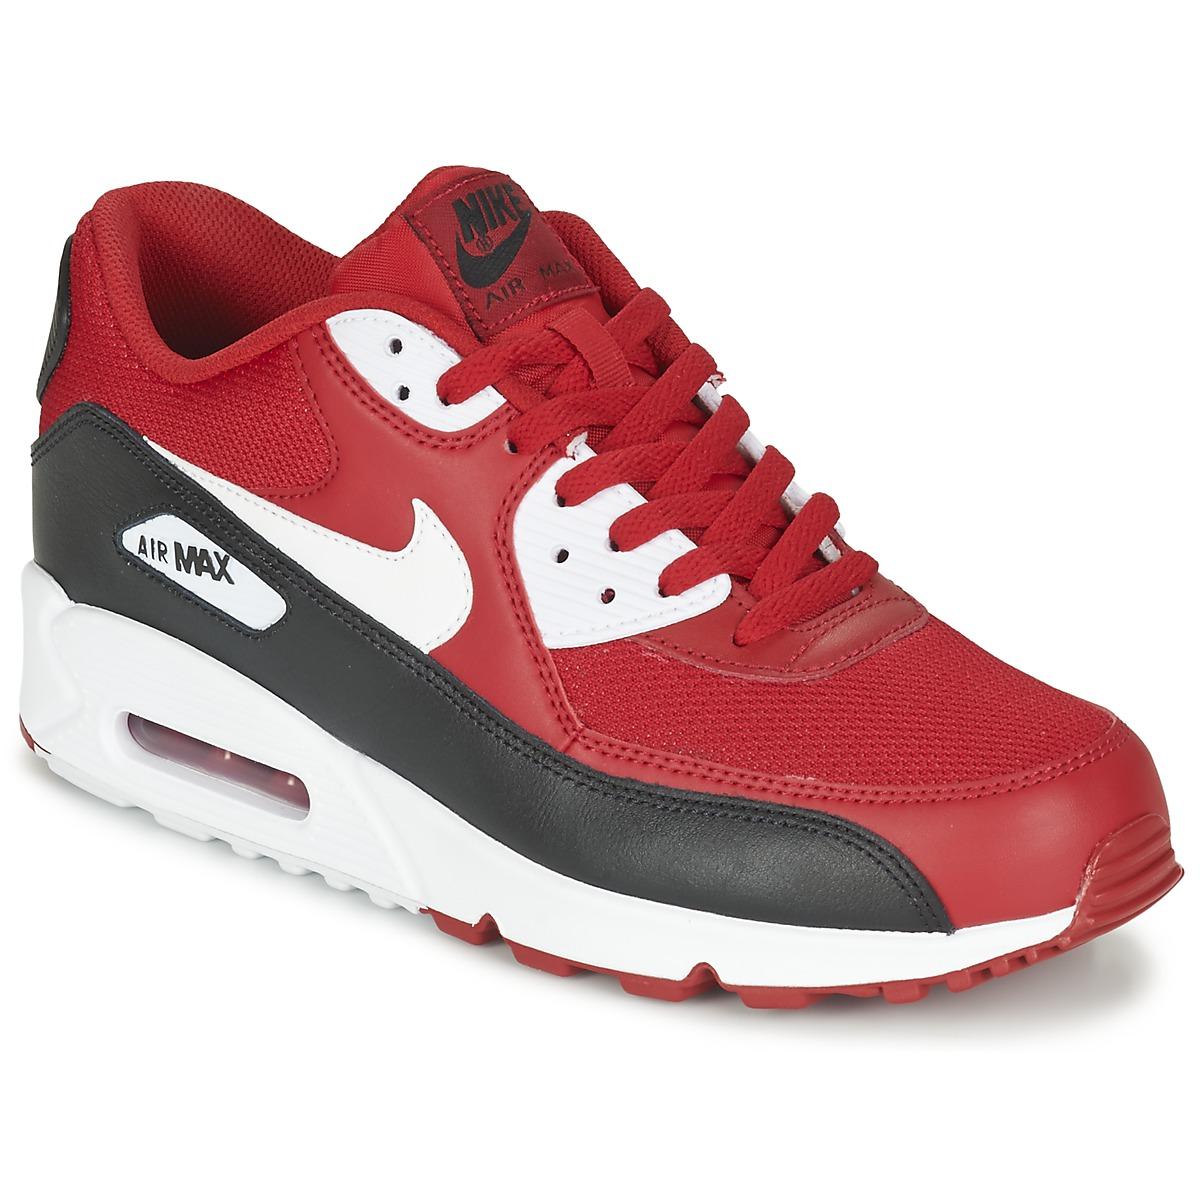 Nike AIR MAX 90 ESSENTIAL Rouge / Noir